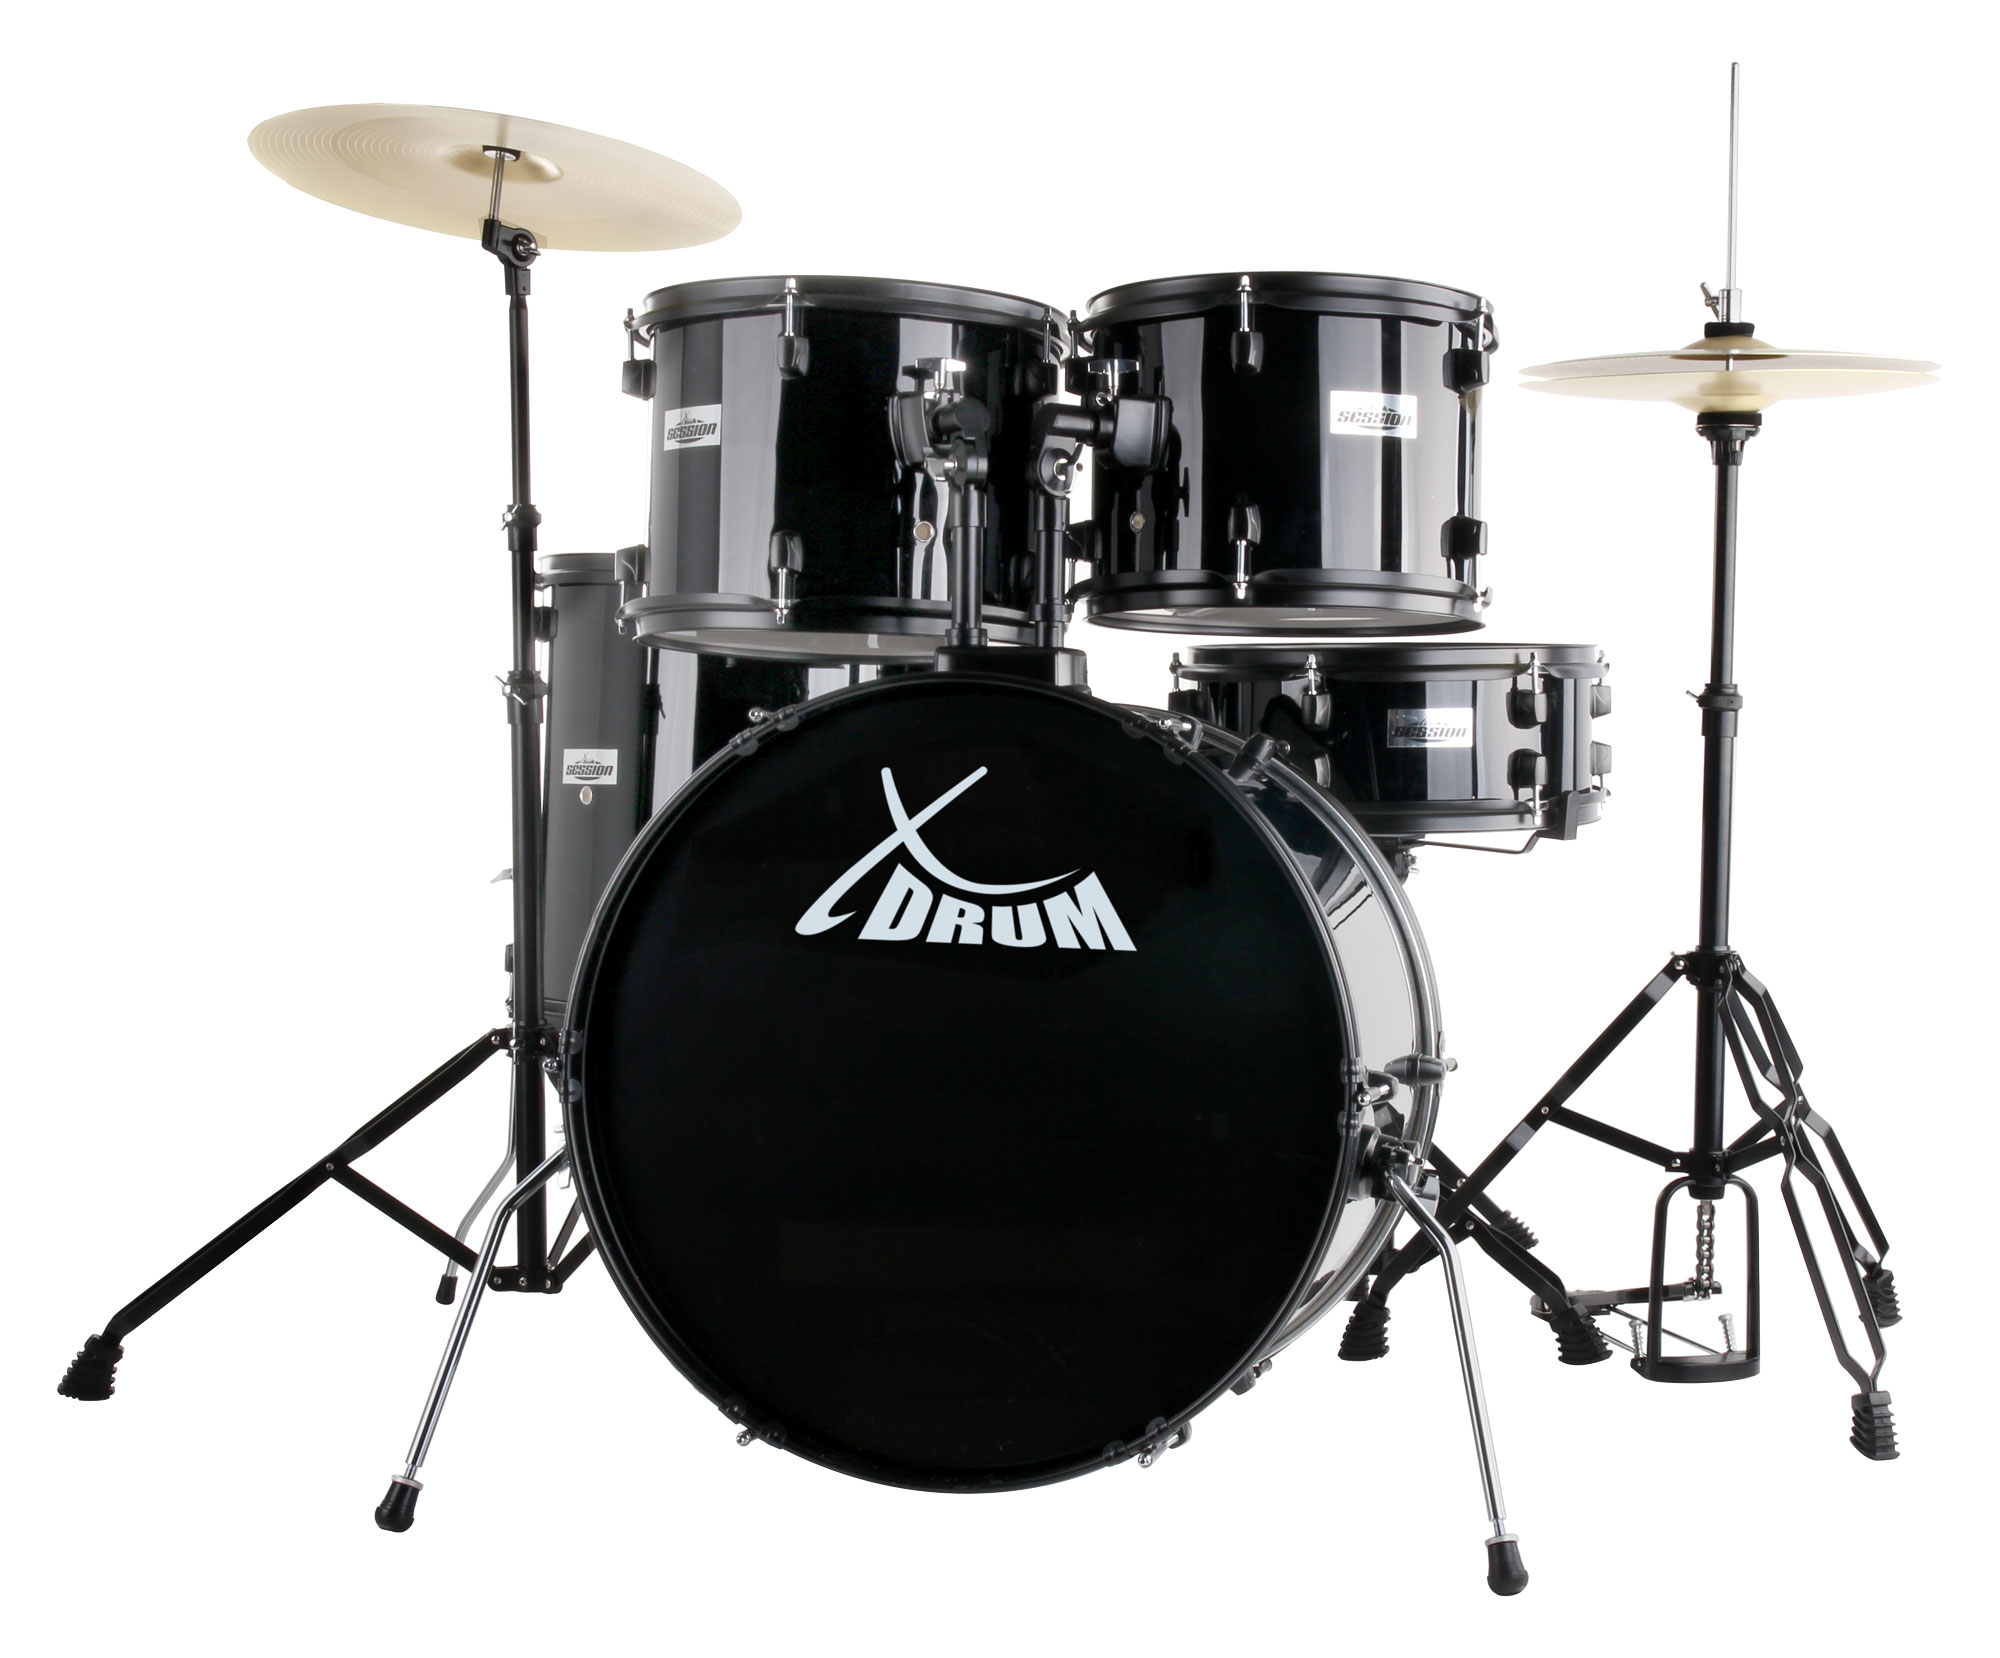 XDrum Rookie 22' Standard Schlagzeug Komplettset Black inkl. Schule DVD